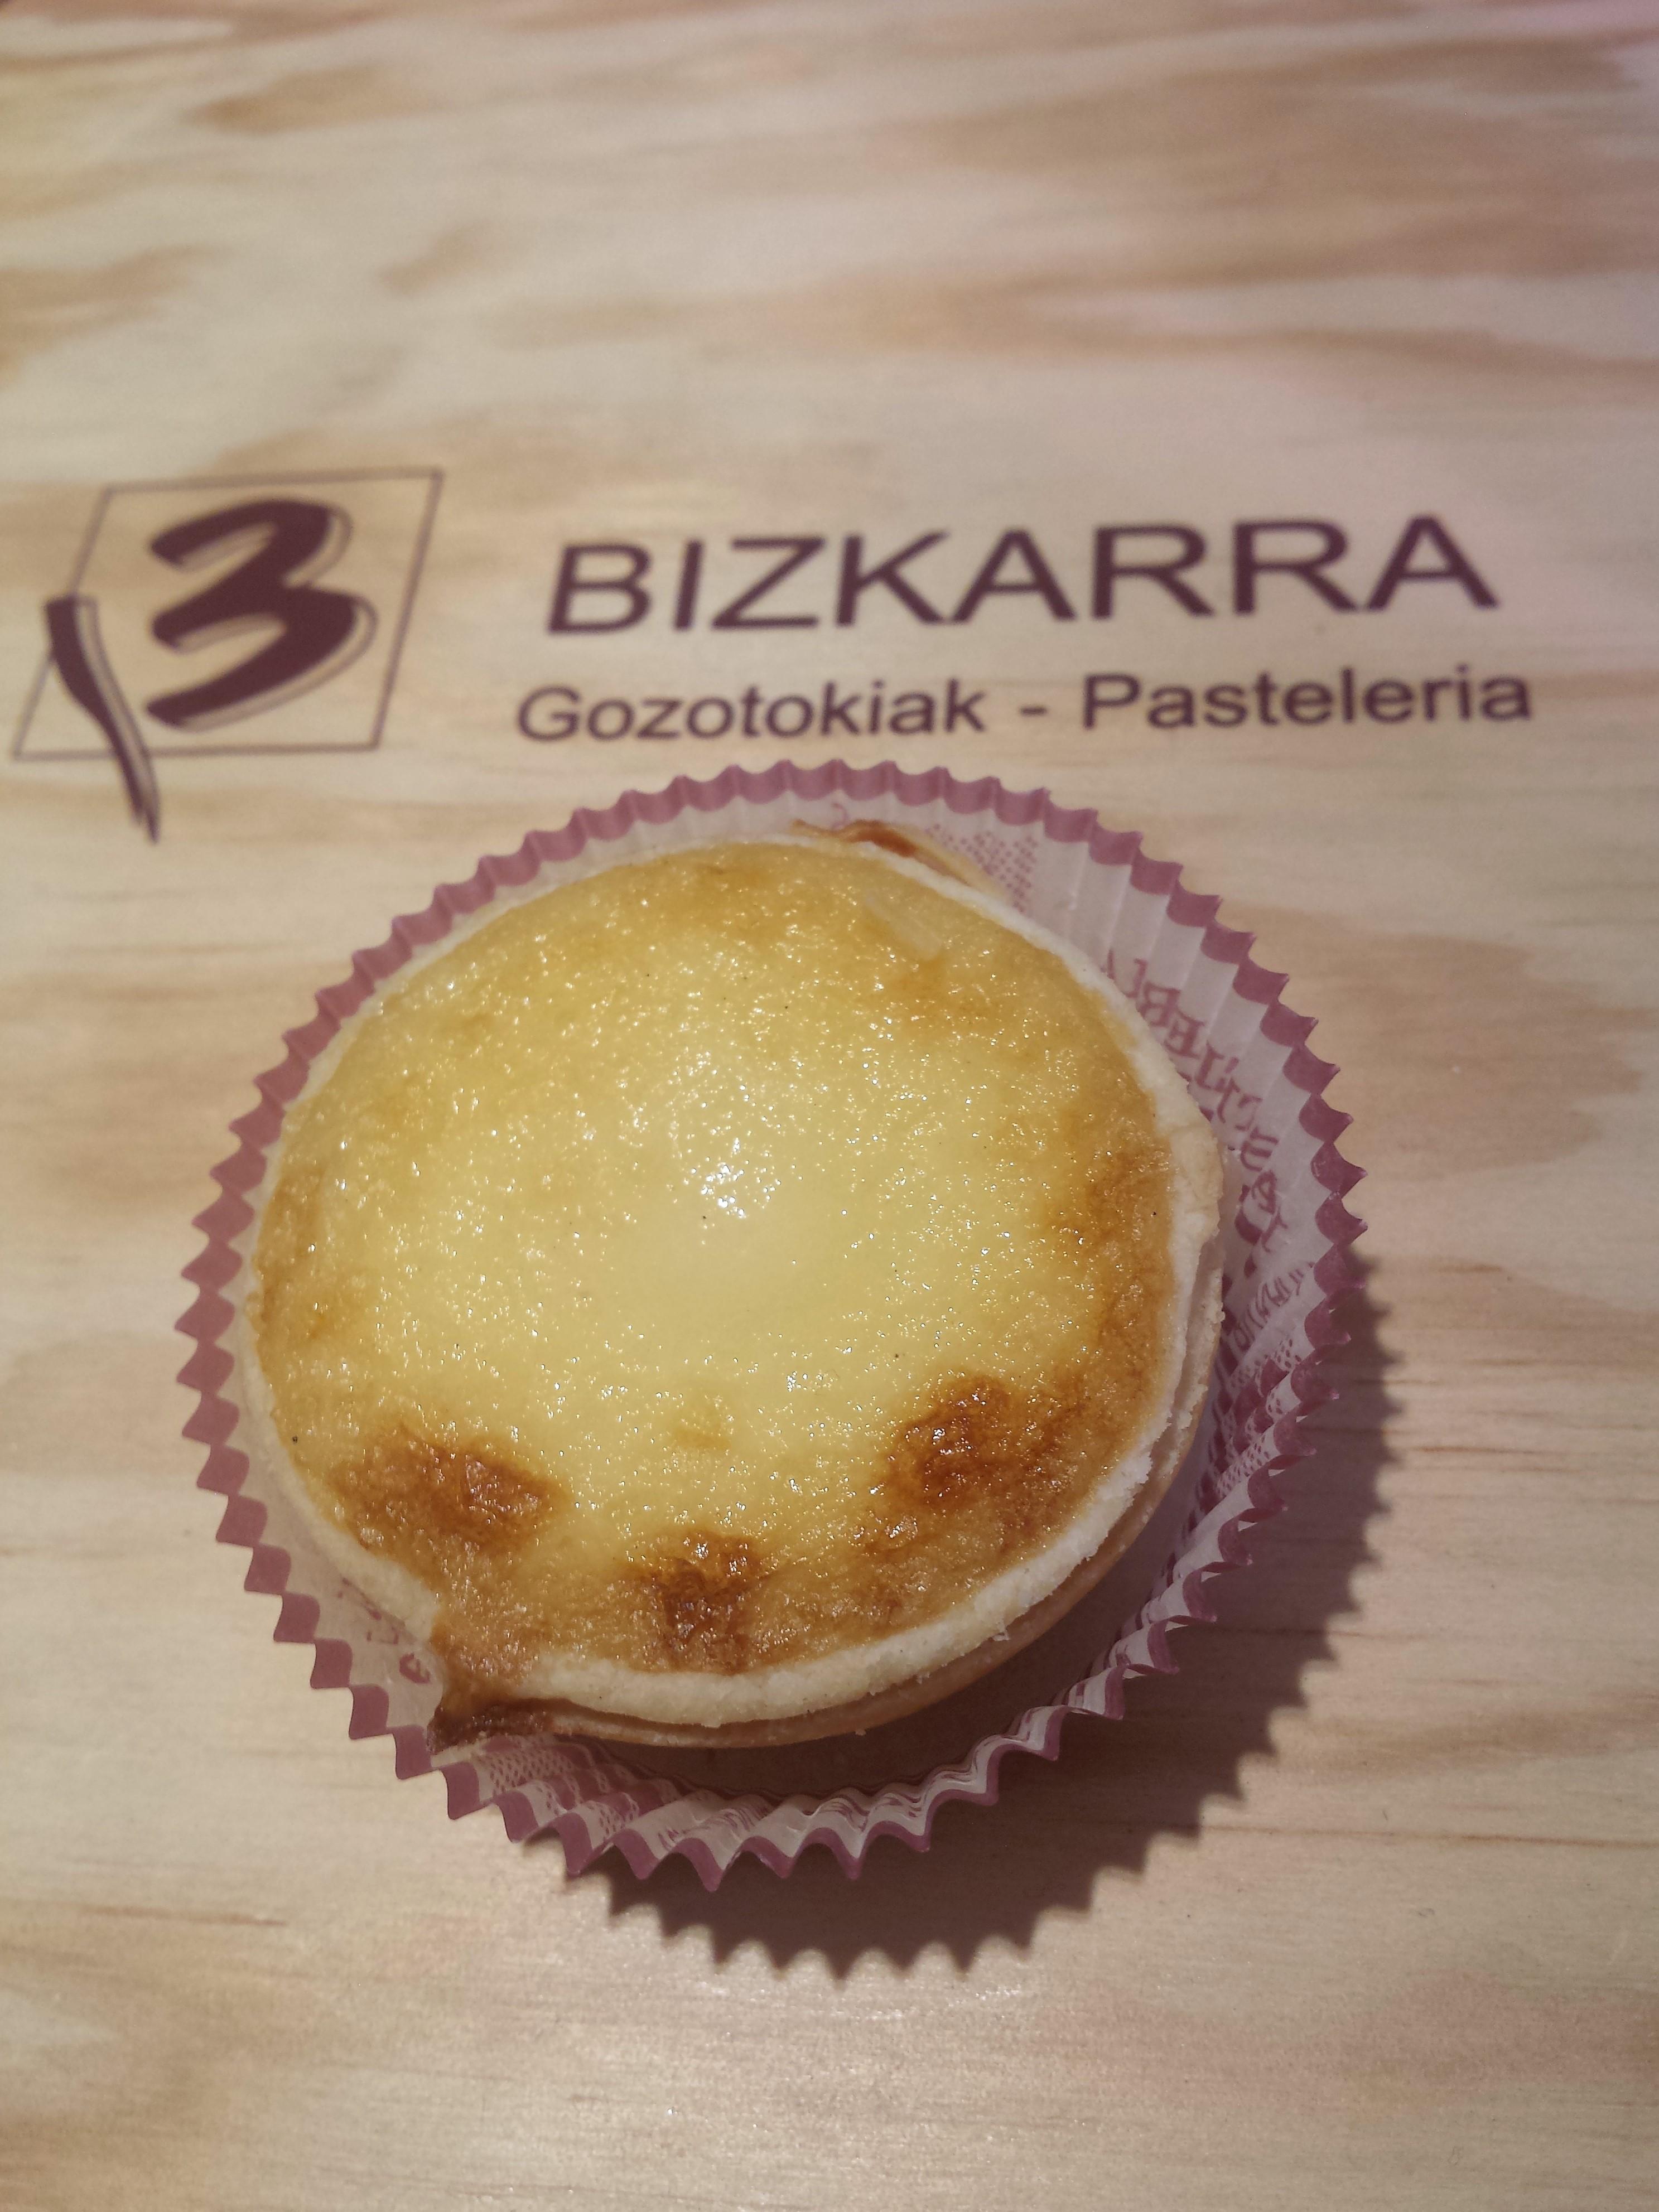 60 aniversario de Bizkarra 3